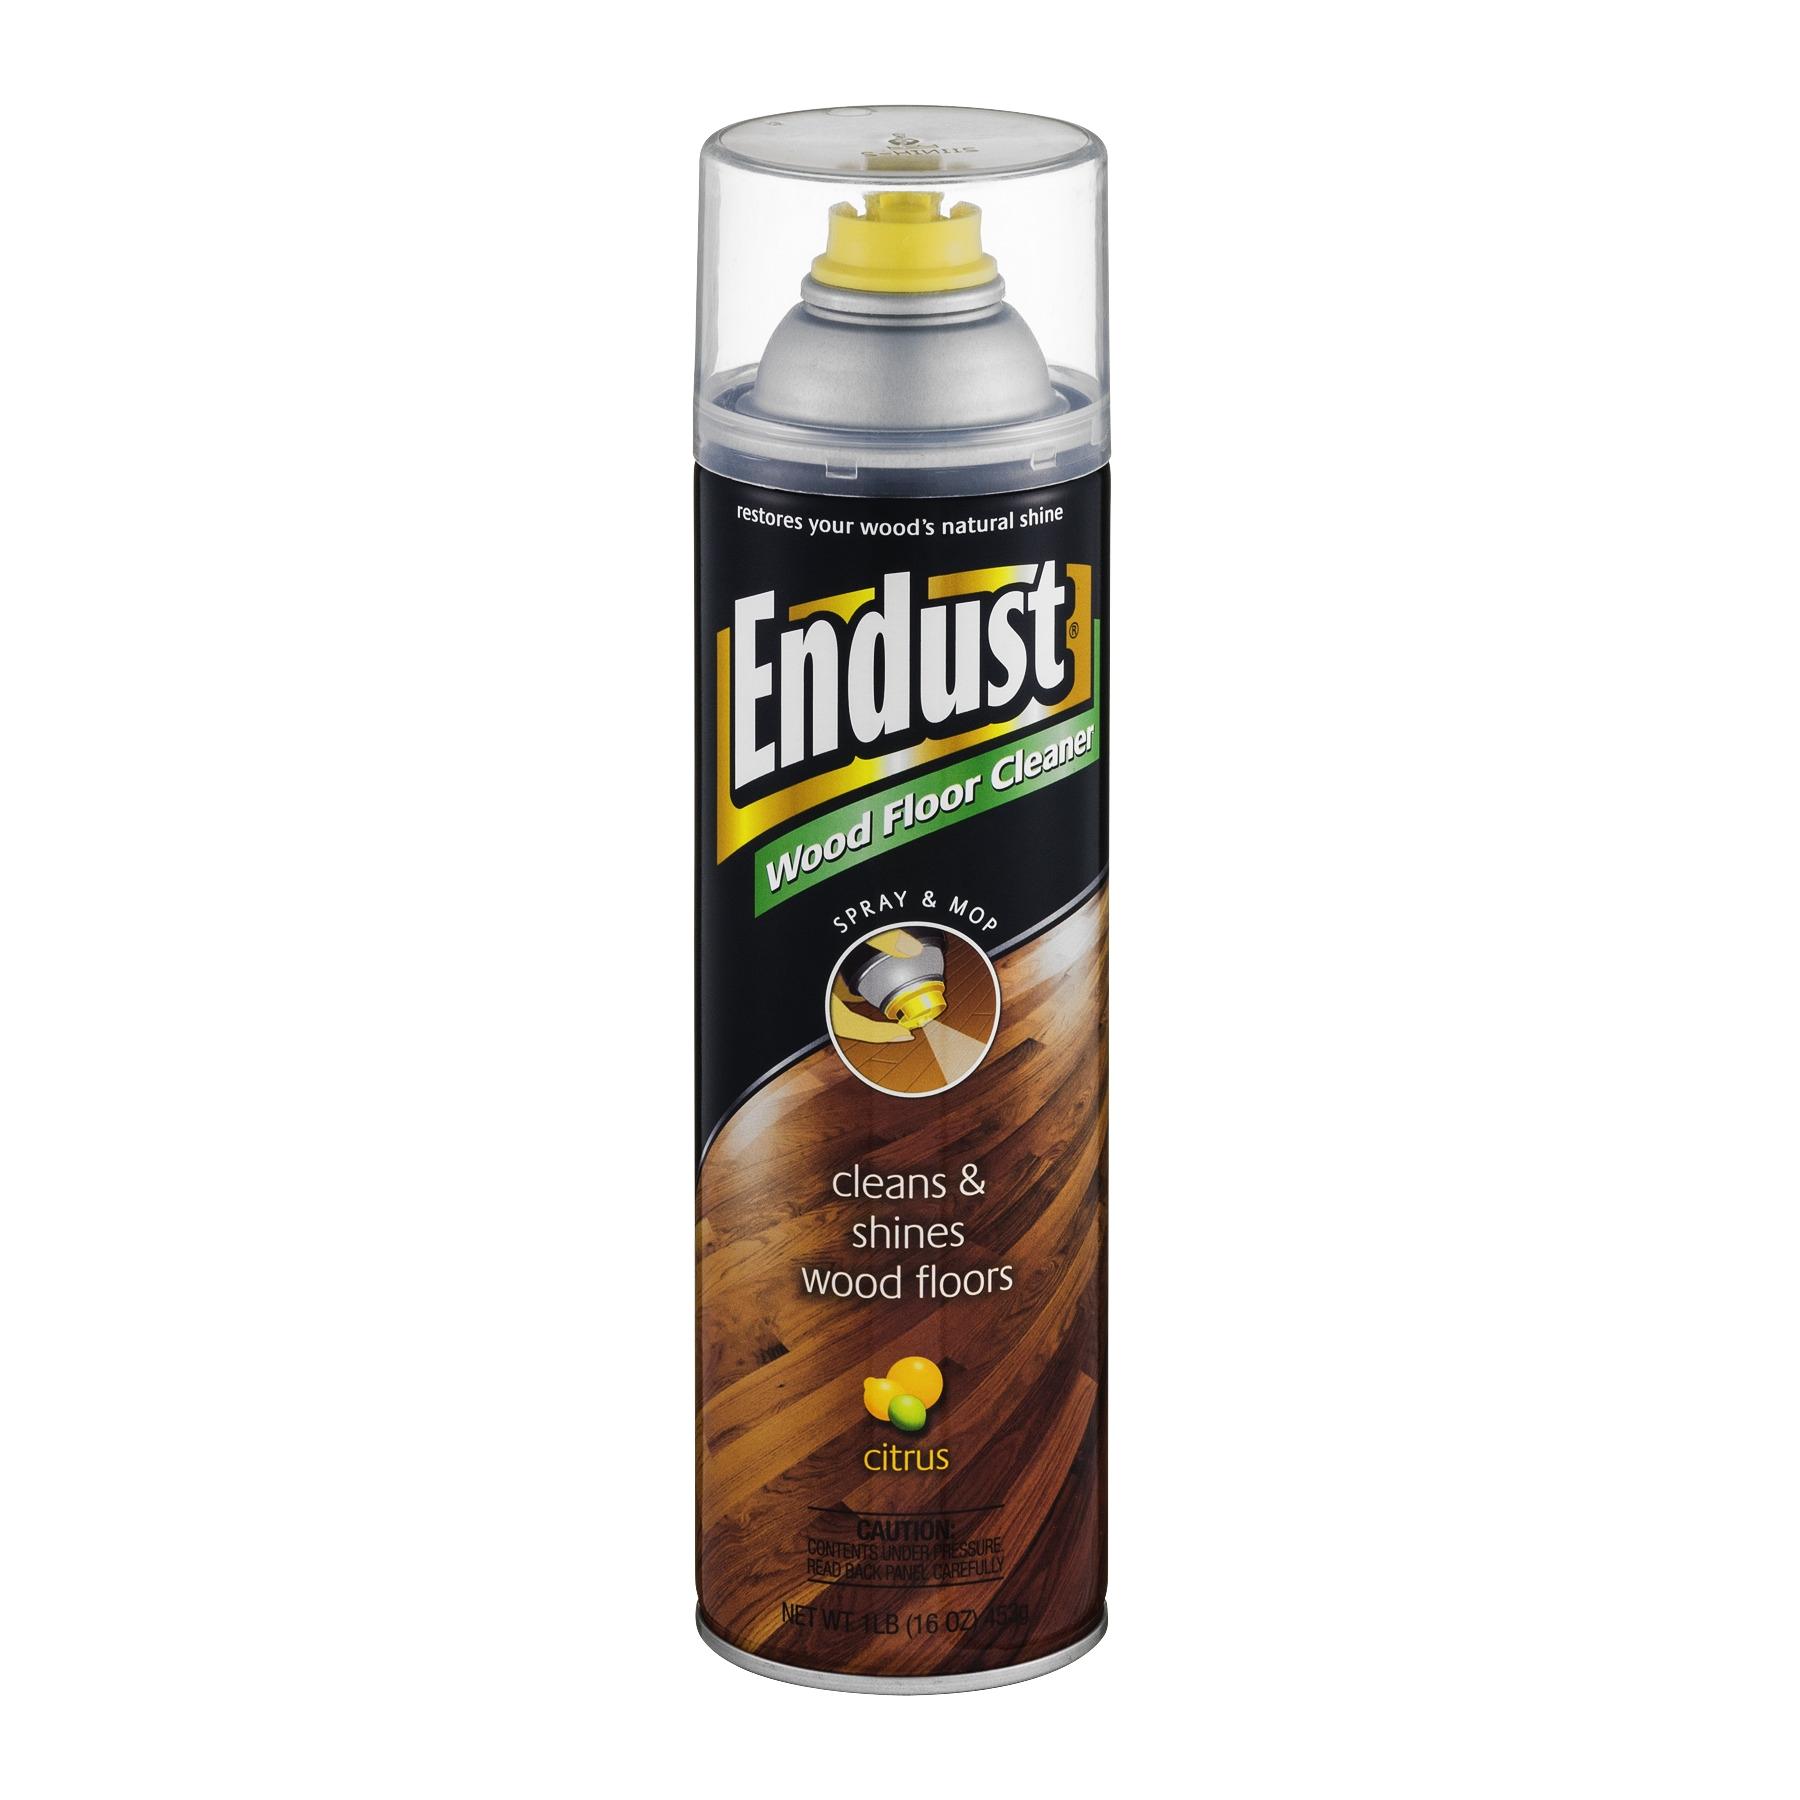 Hardwood Floor Cleaners at Walmart Endust Citrus Wood Floor Cleaner 16 Oz Walmart Com